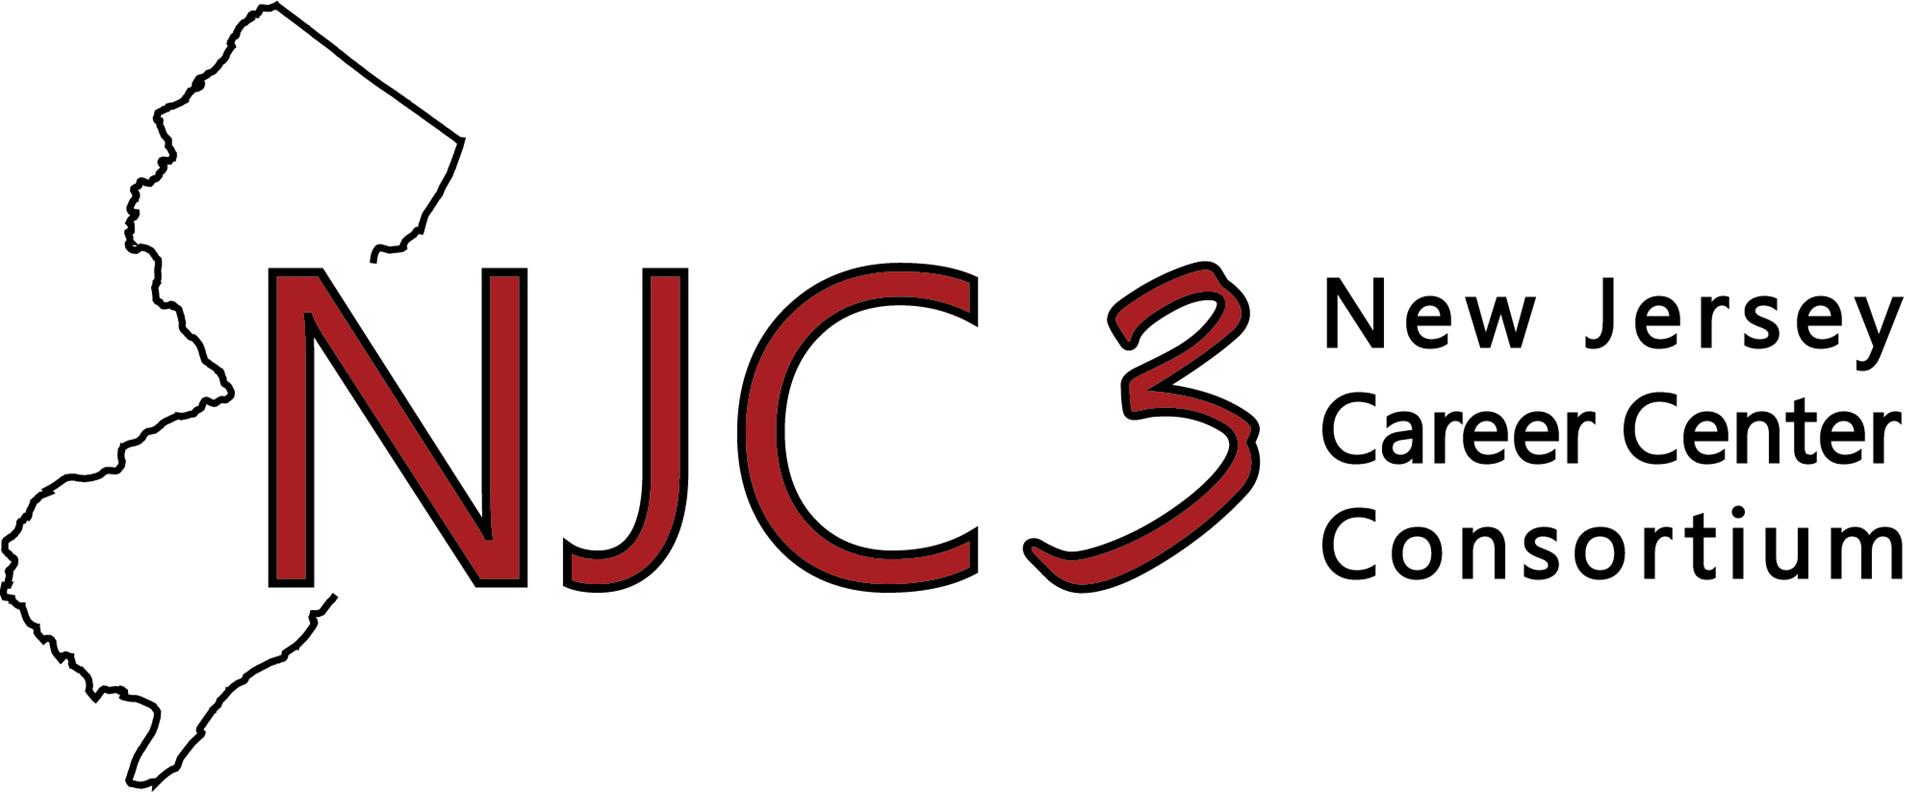 Astounding New Jersey Career Center Consortium Njc3 Fall 2018 Event Home Interior And Landscaping Spoatsignezvosmurscom